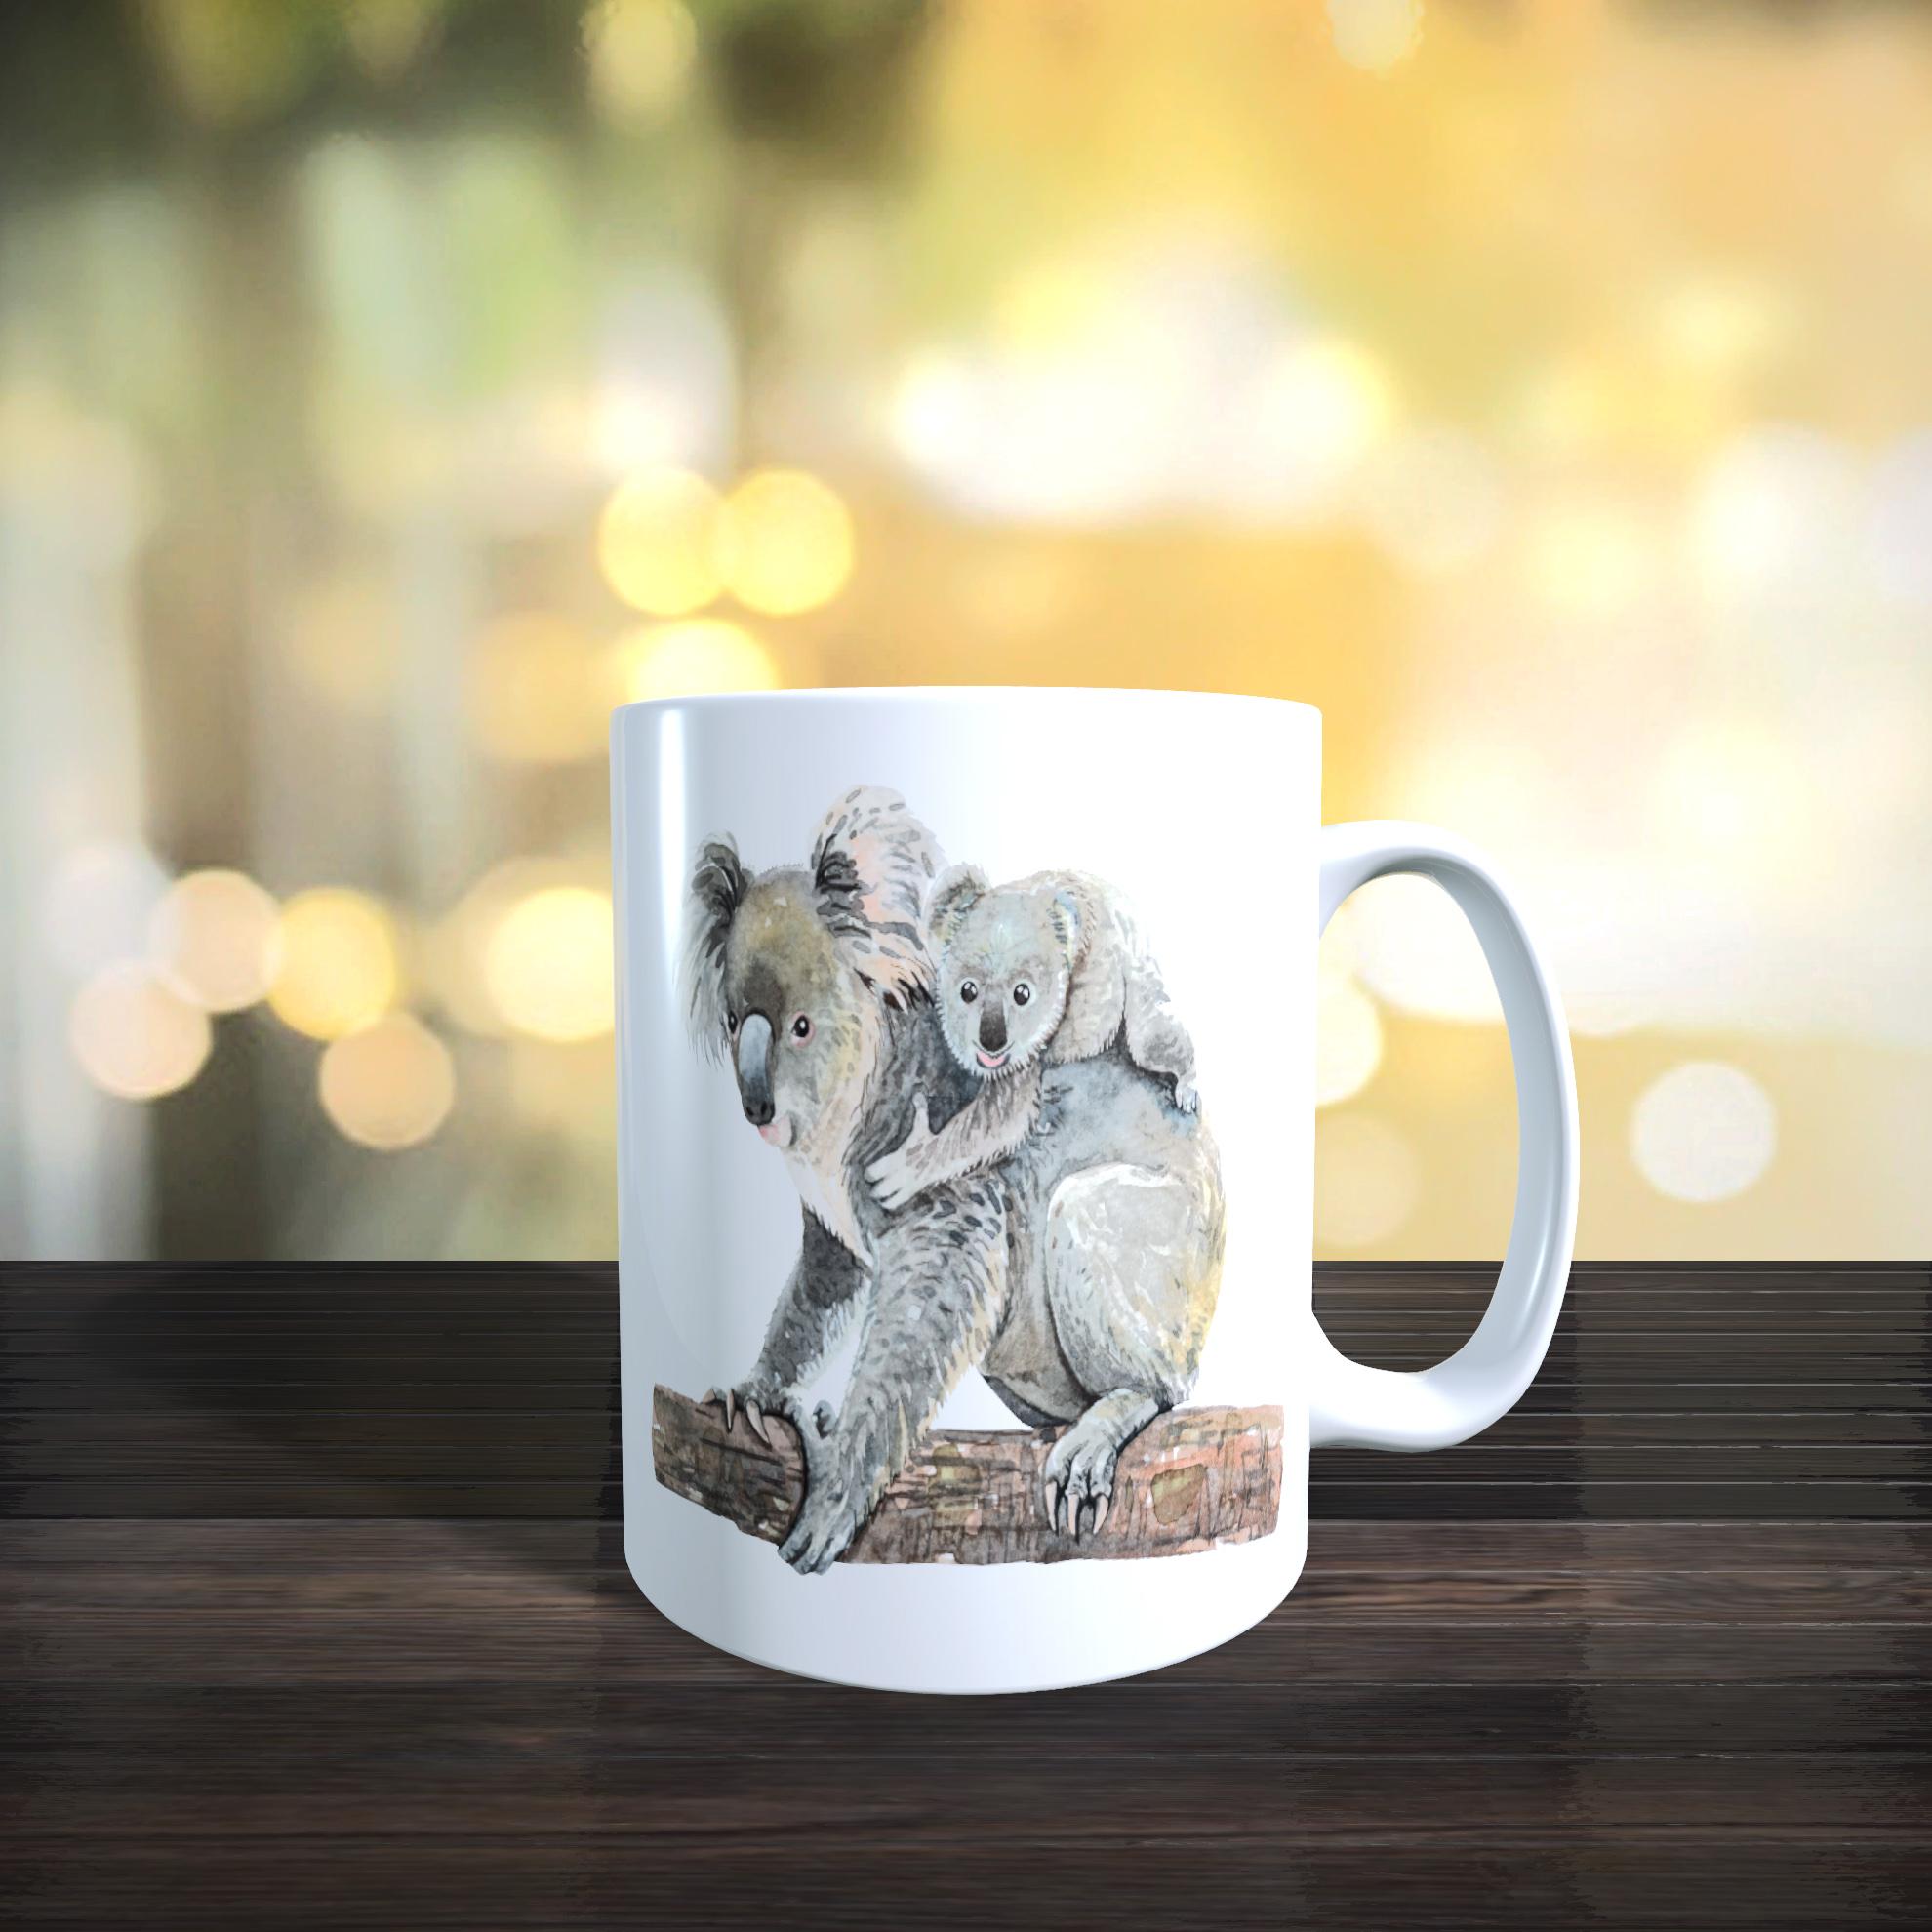 Cute Mother and Baby Koala Bear 11oz Ceramic Mothers Day / Birthday Gift Mug.